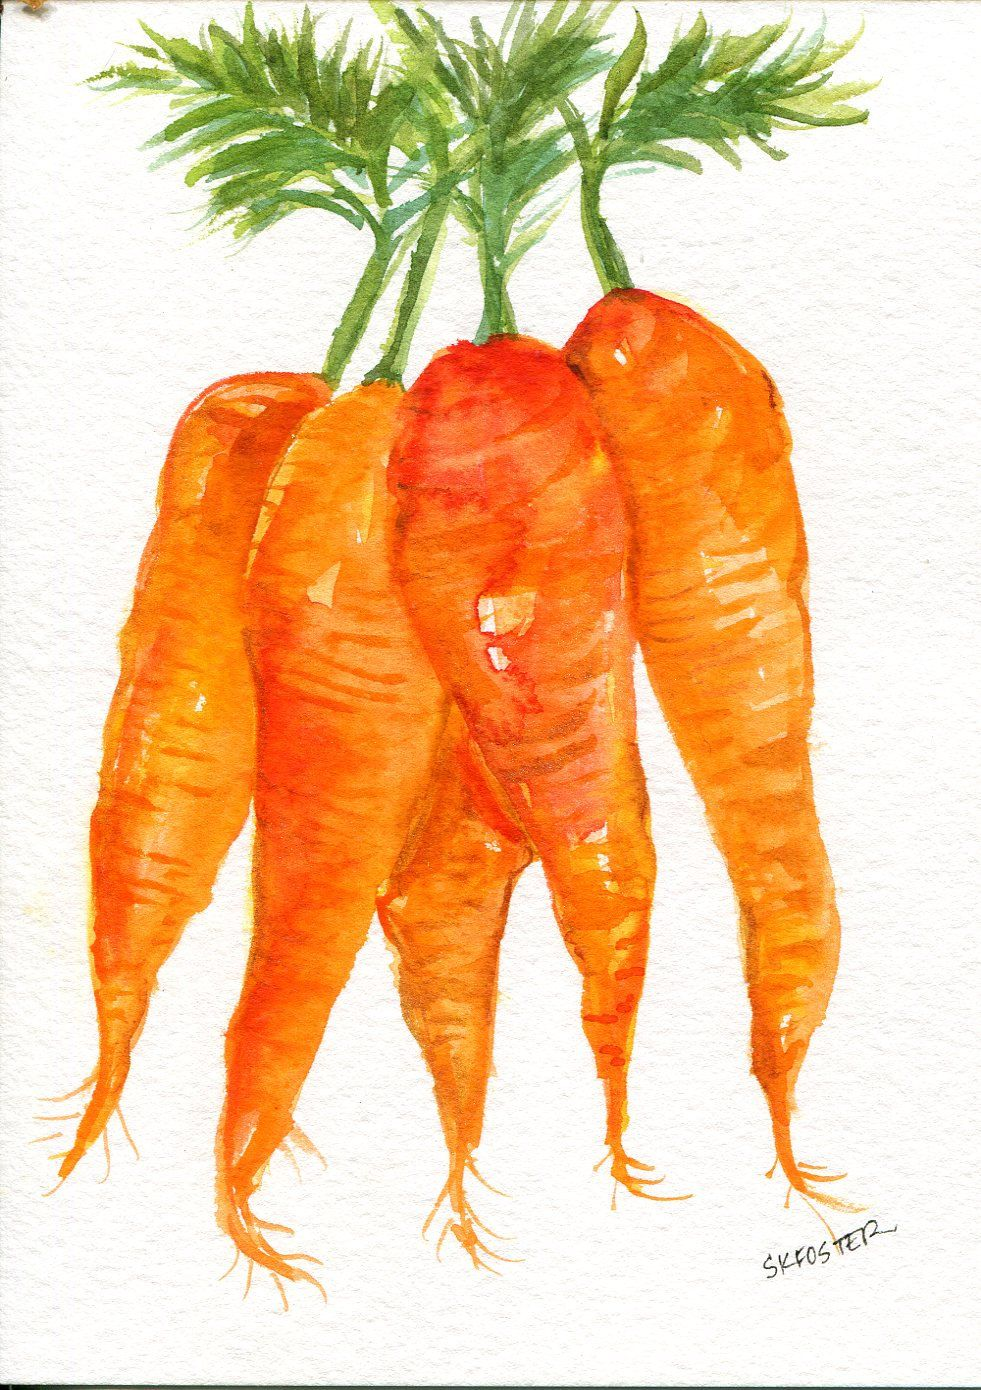 Carrots watercolor painting original vegetables 5 x 7 ...